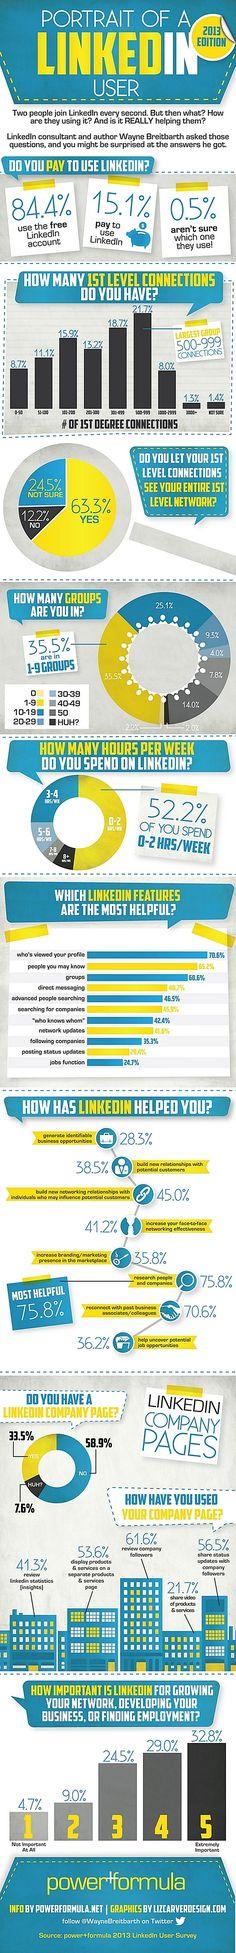 #LinkedIn, users, data, infographic,